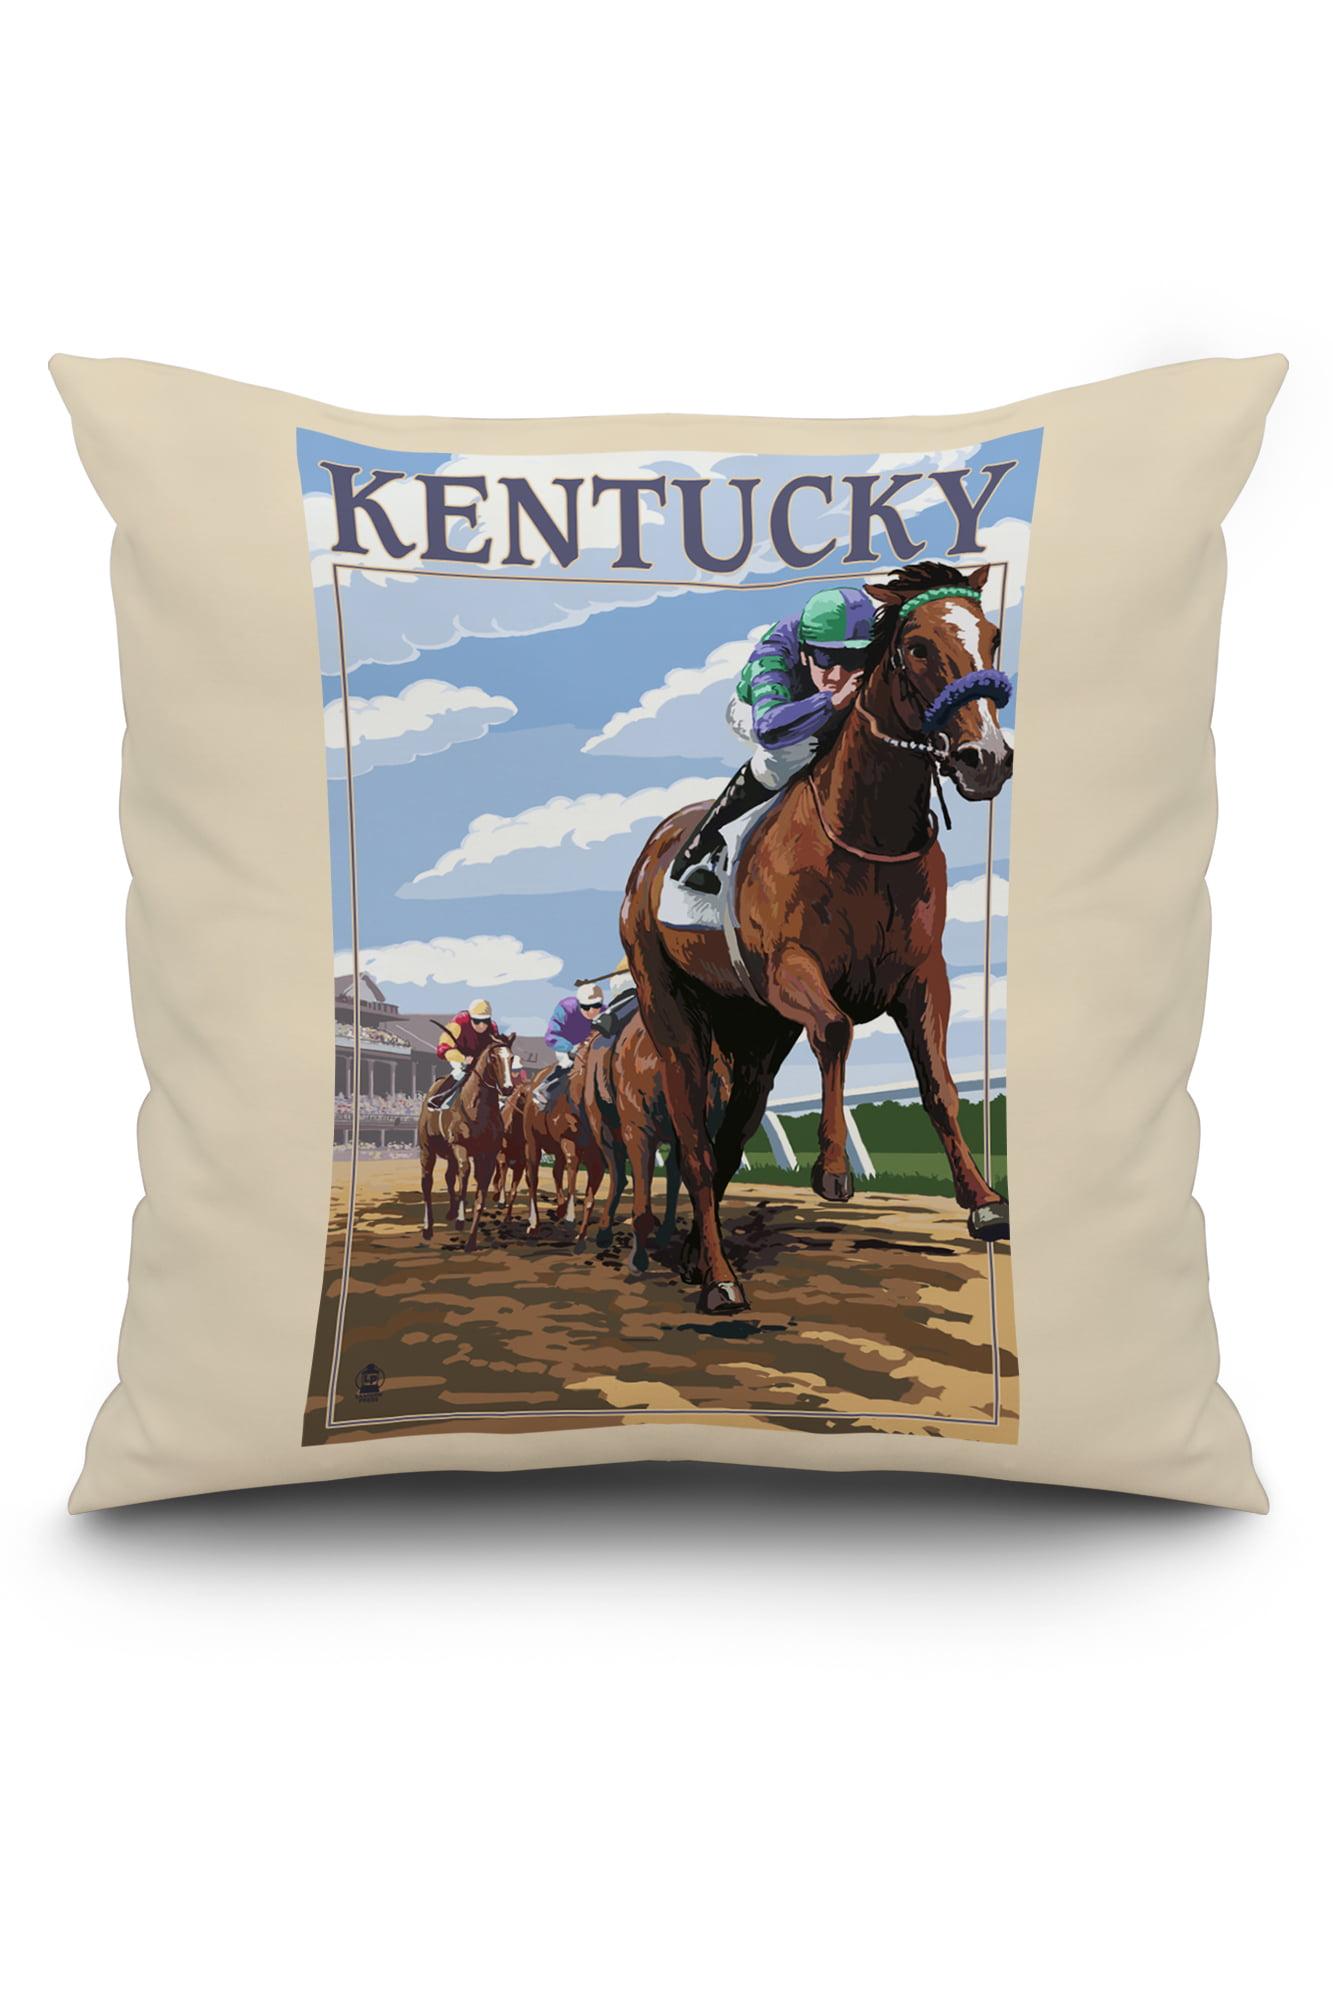 Horse Pillow READY